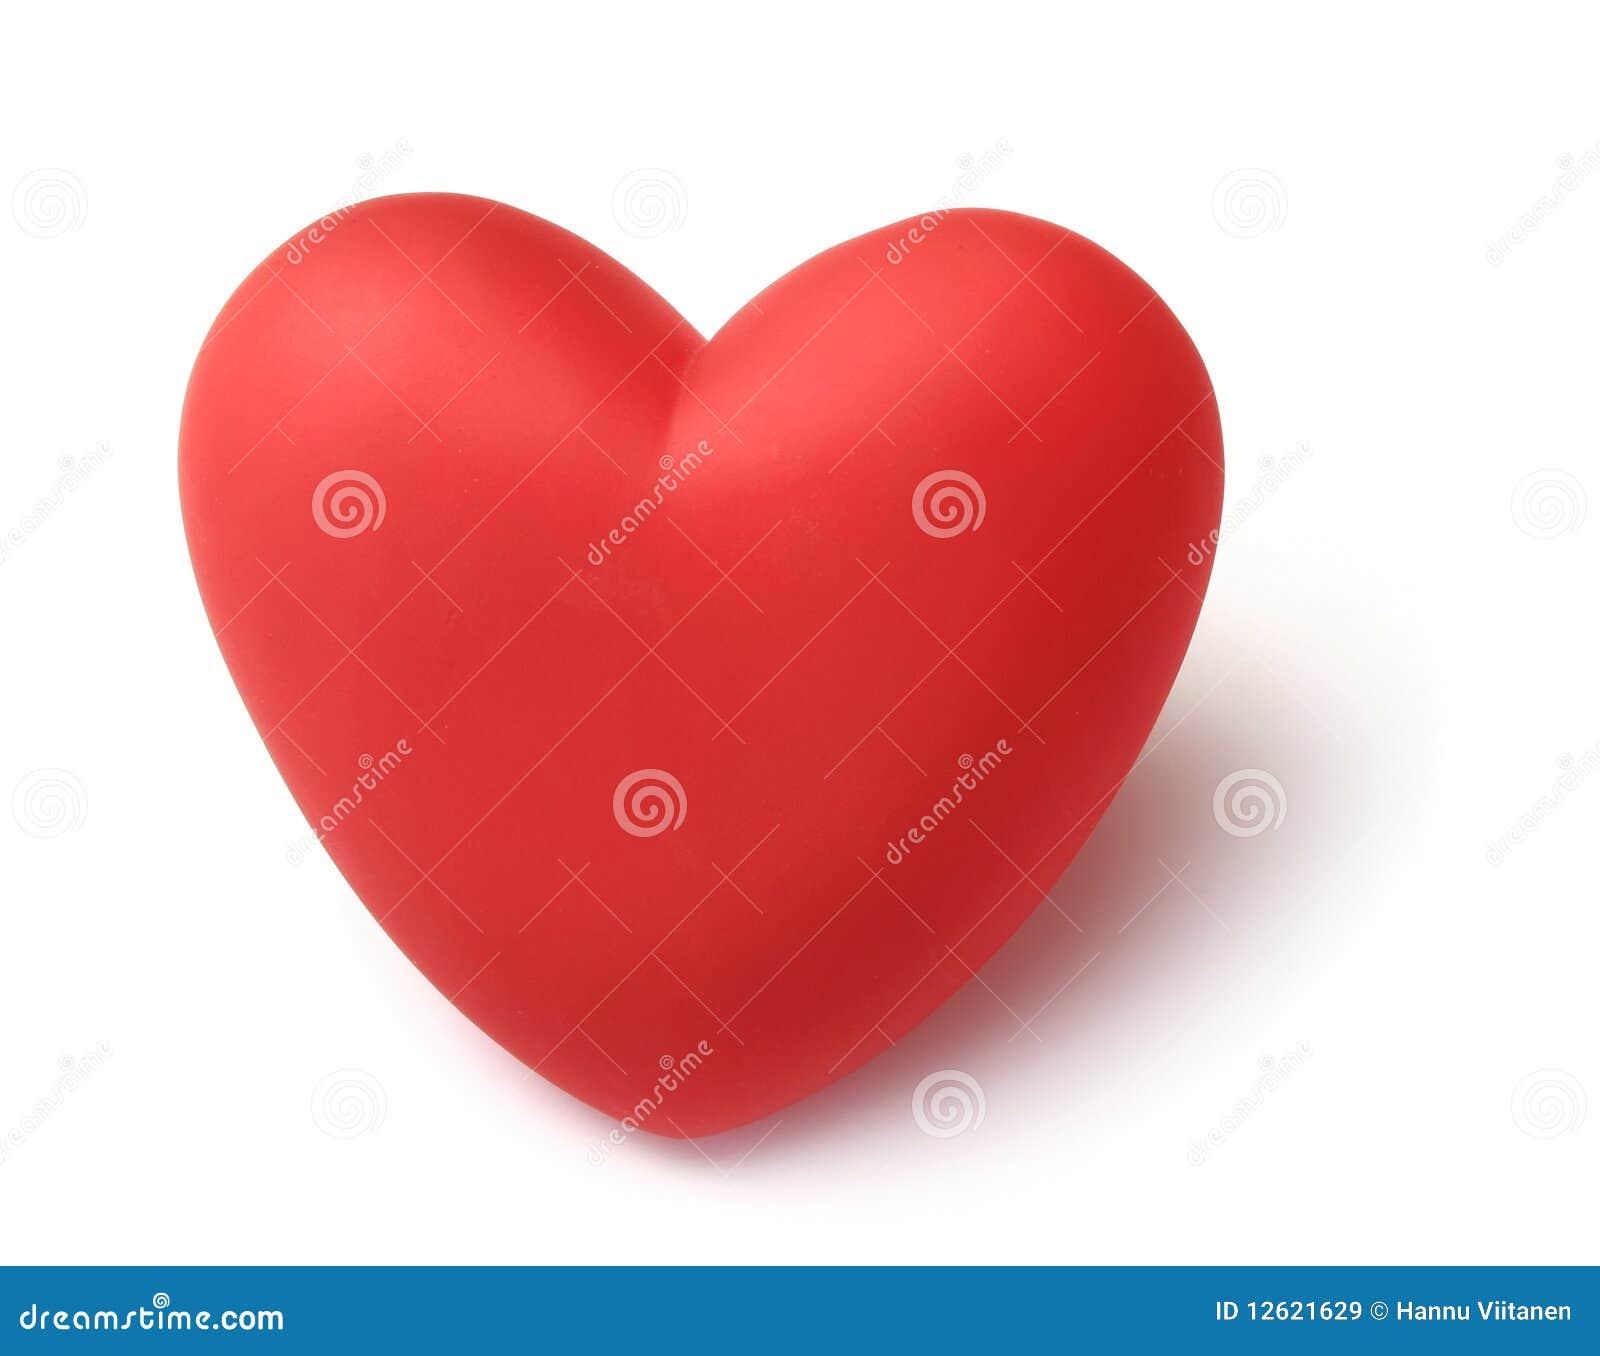 Big Valentine heart